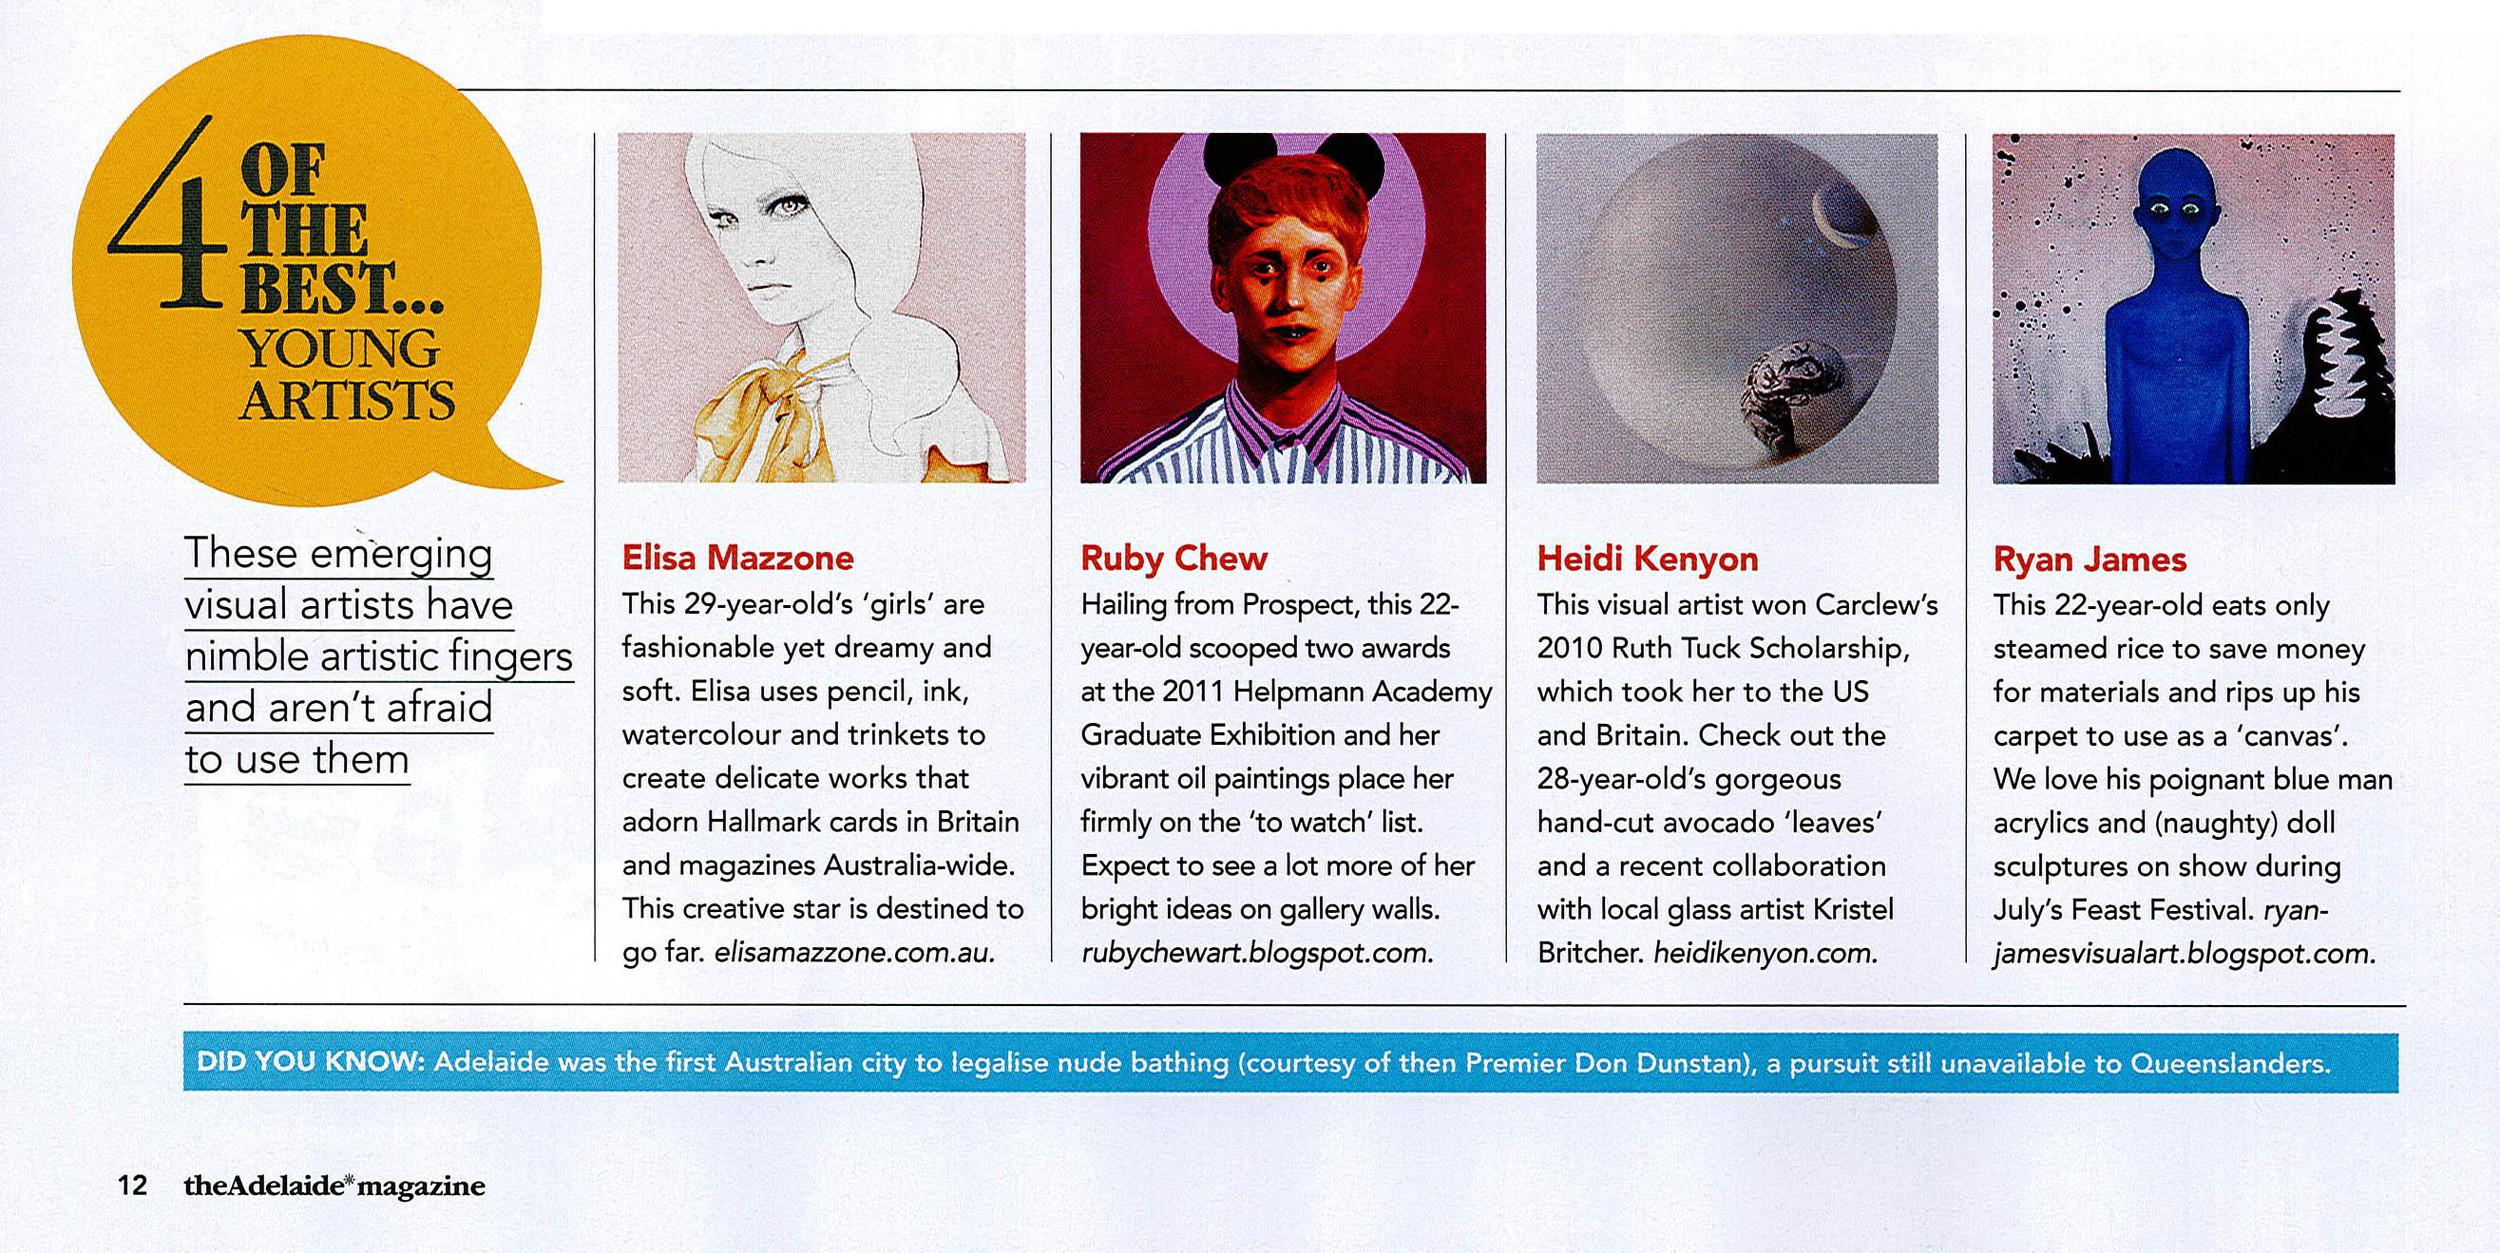 Best of the 4, Adelaide Magazine Best of Adelaide 2011, Dec 2011